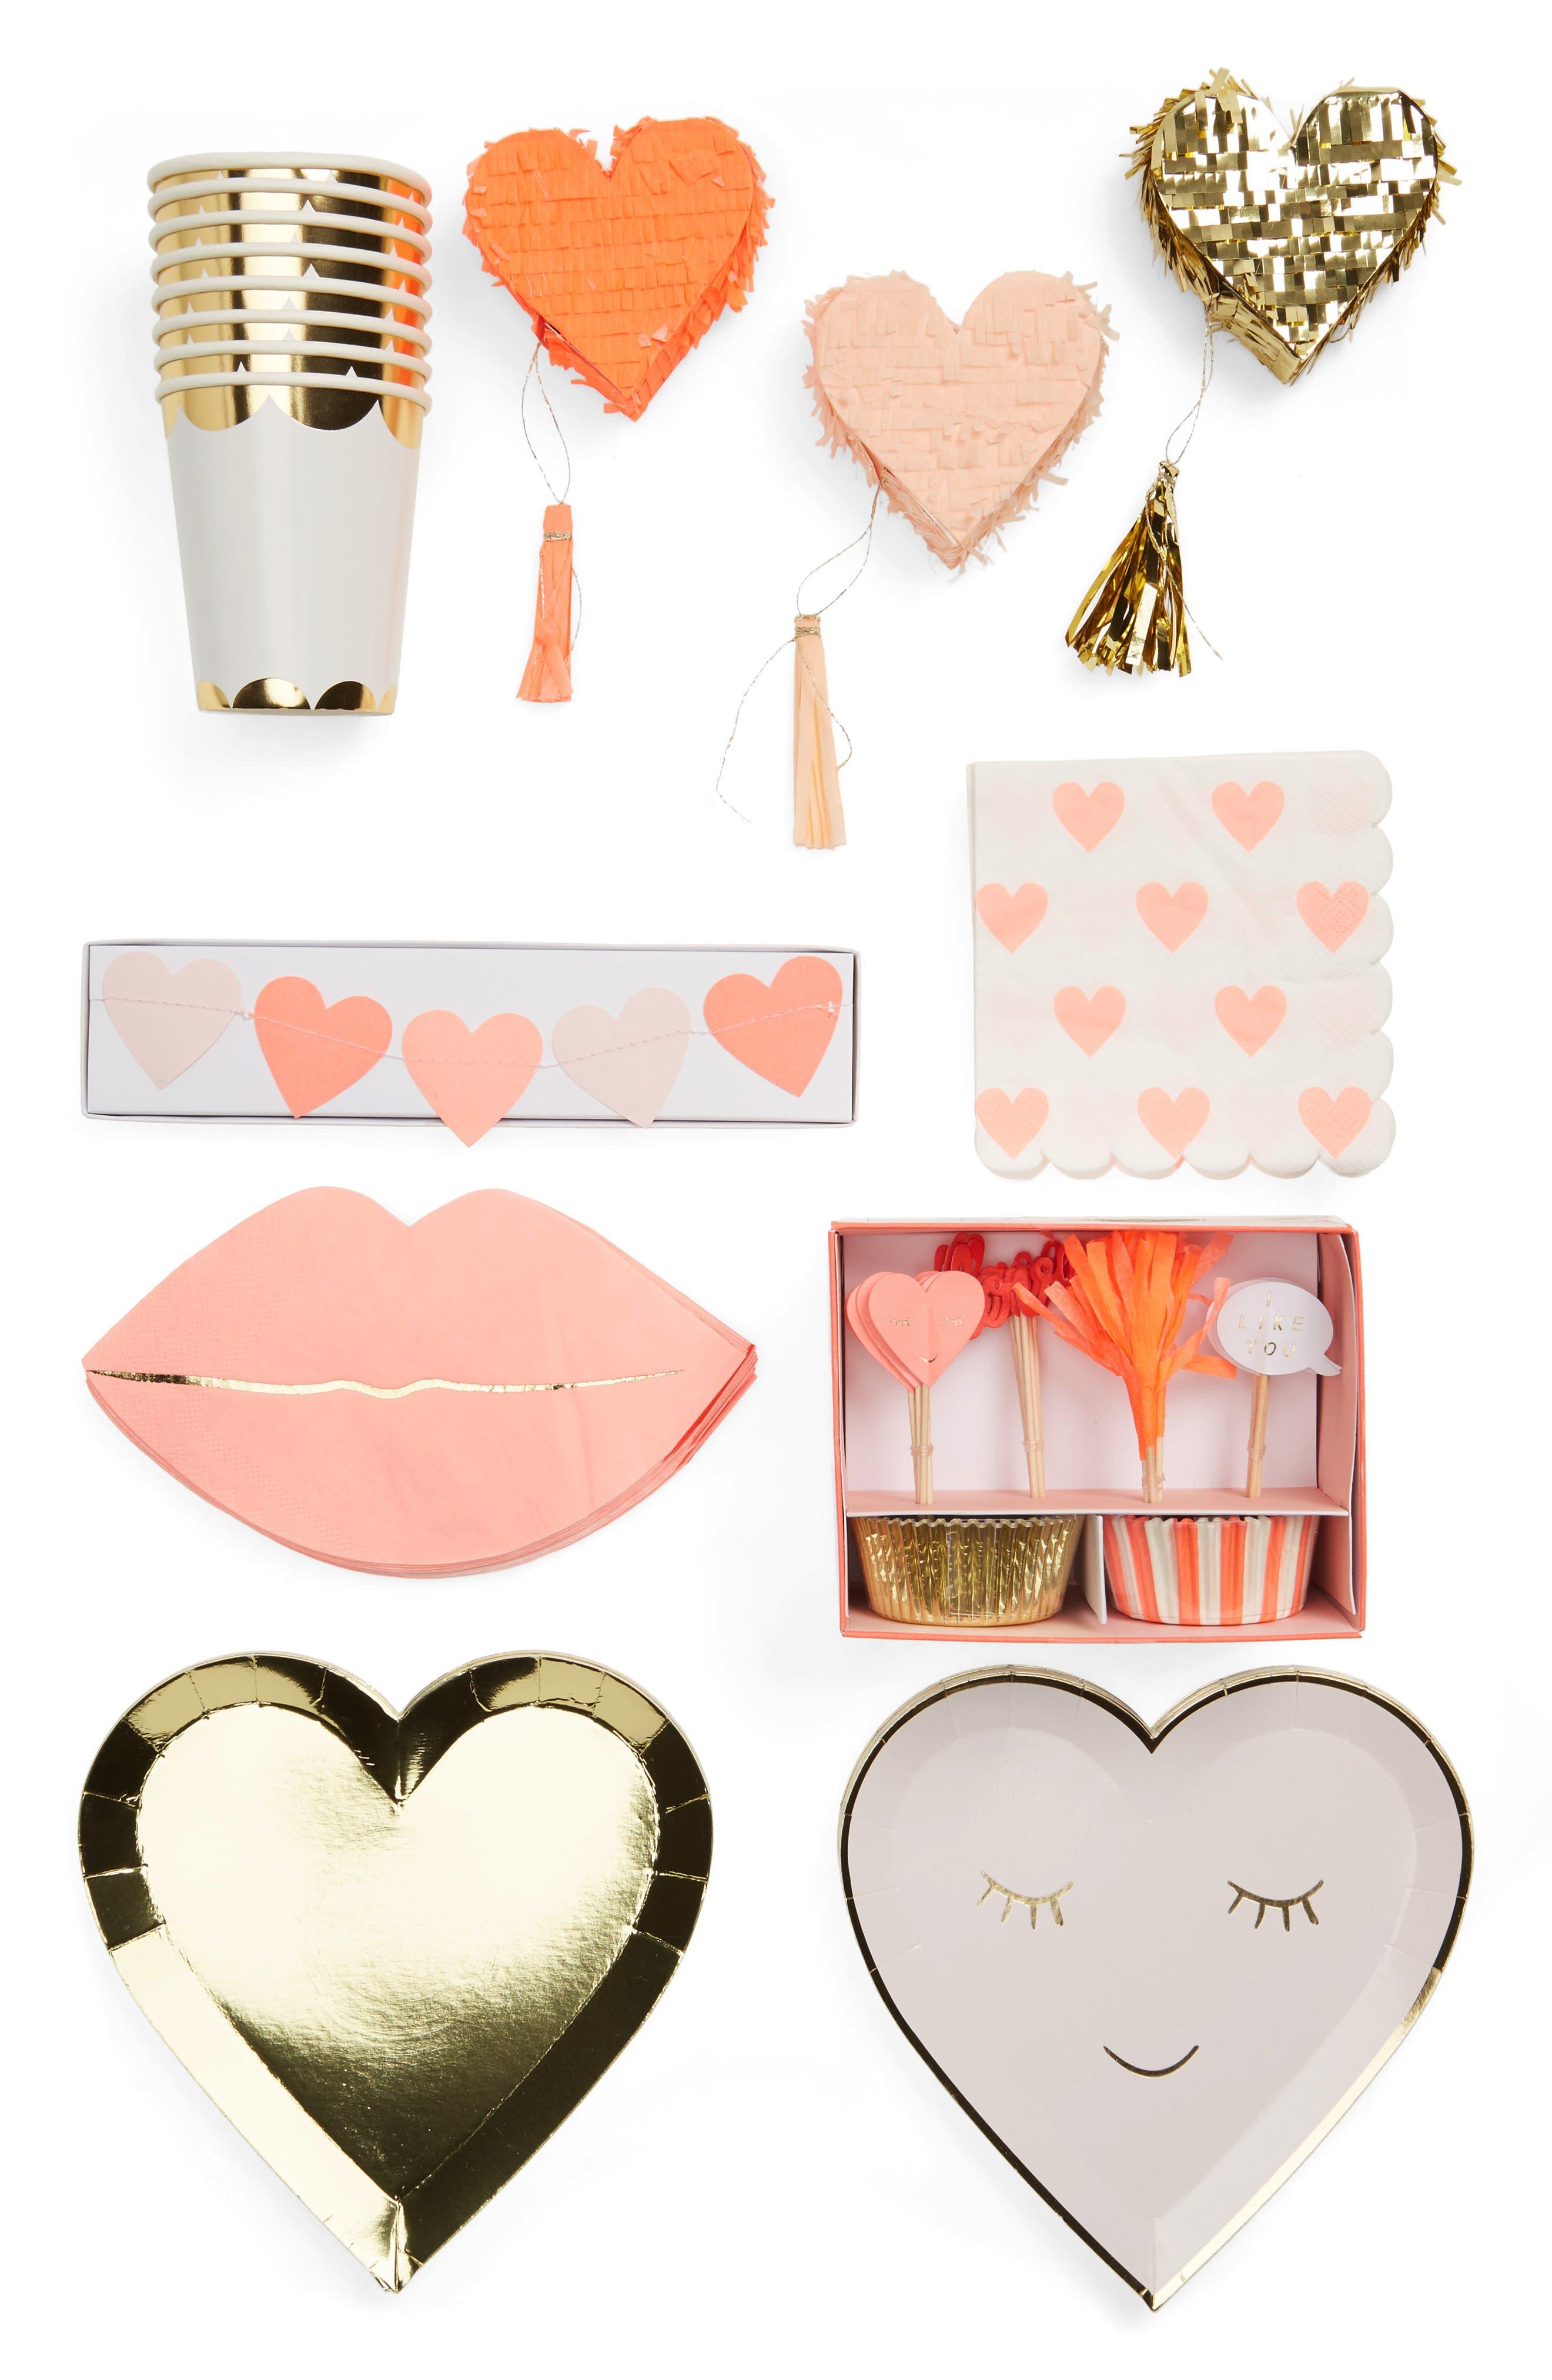 Alternate Image 1 Selected - Meri Meri Valentine's Day Party Bundle